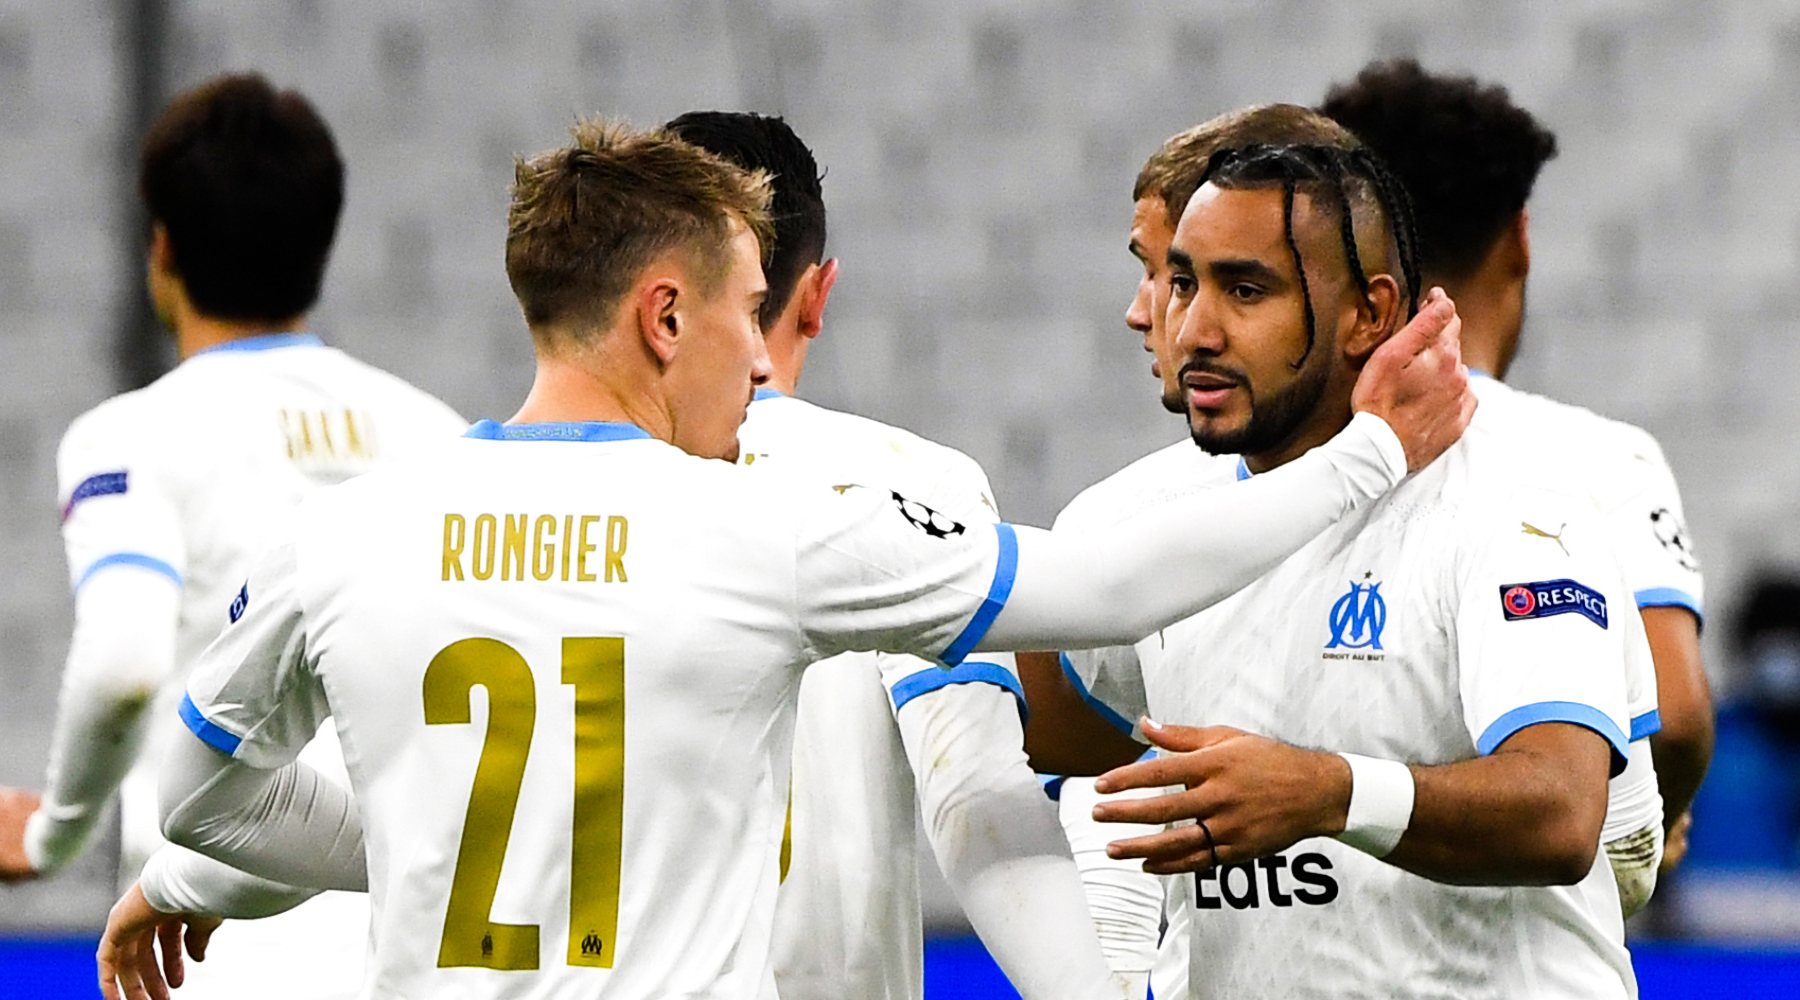 Nhan-dinh-Nimes-vs-Marseille